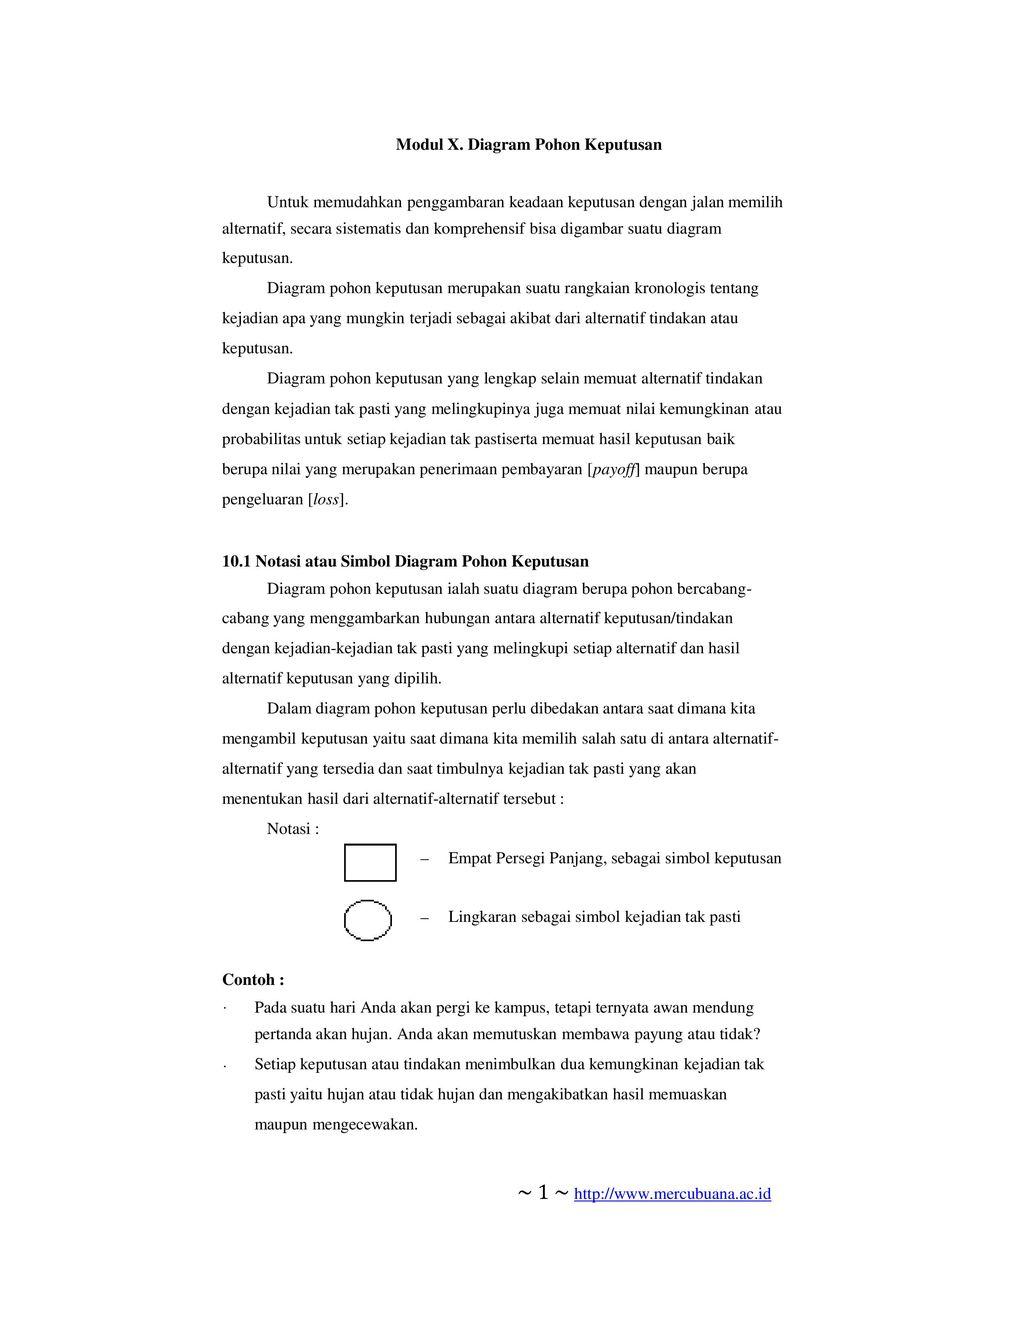 Modul x diagram pohon keputusan ppt download modul x diagram pohon keputusan ccuart Images